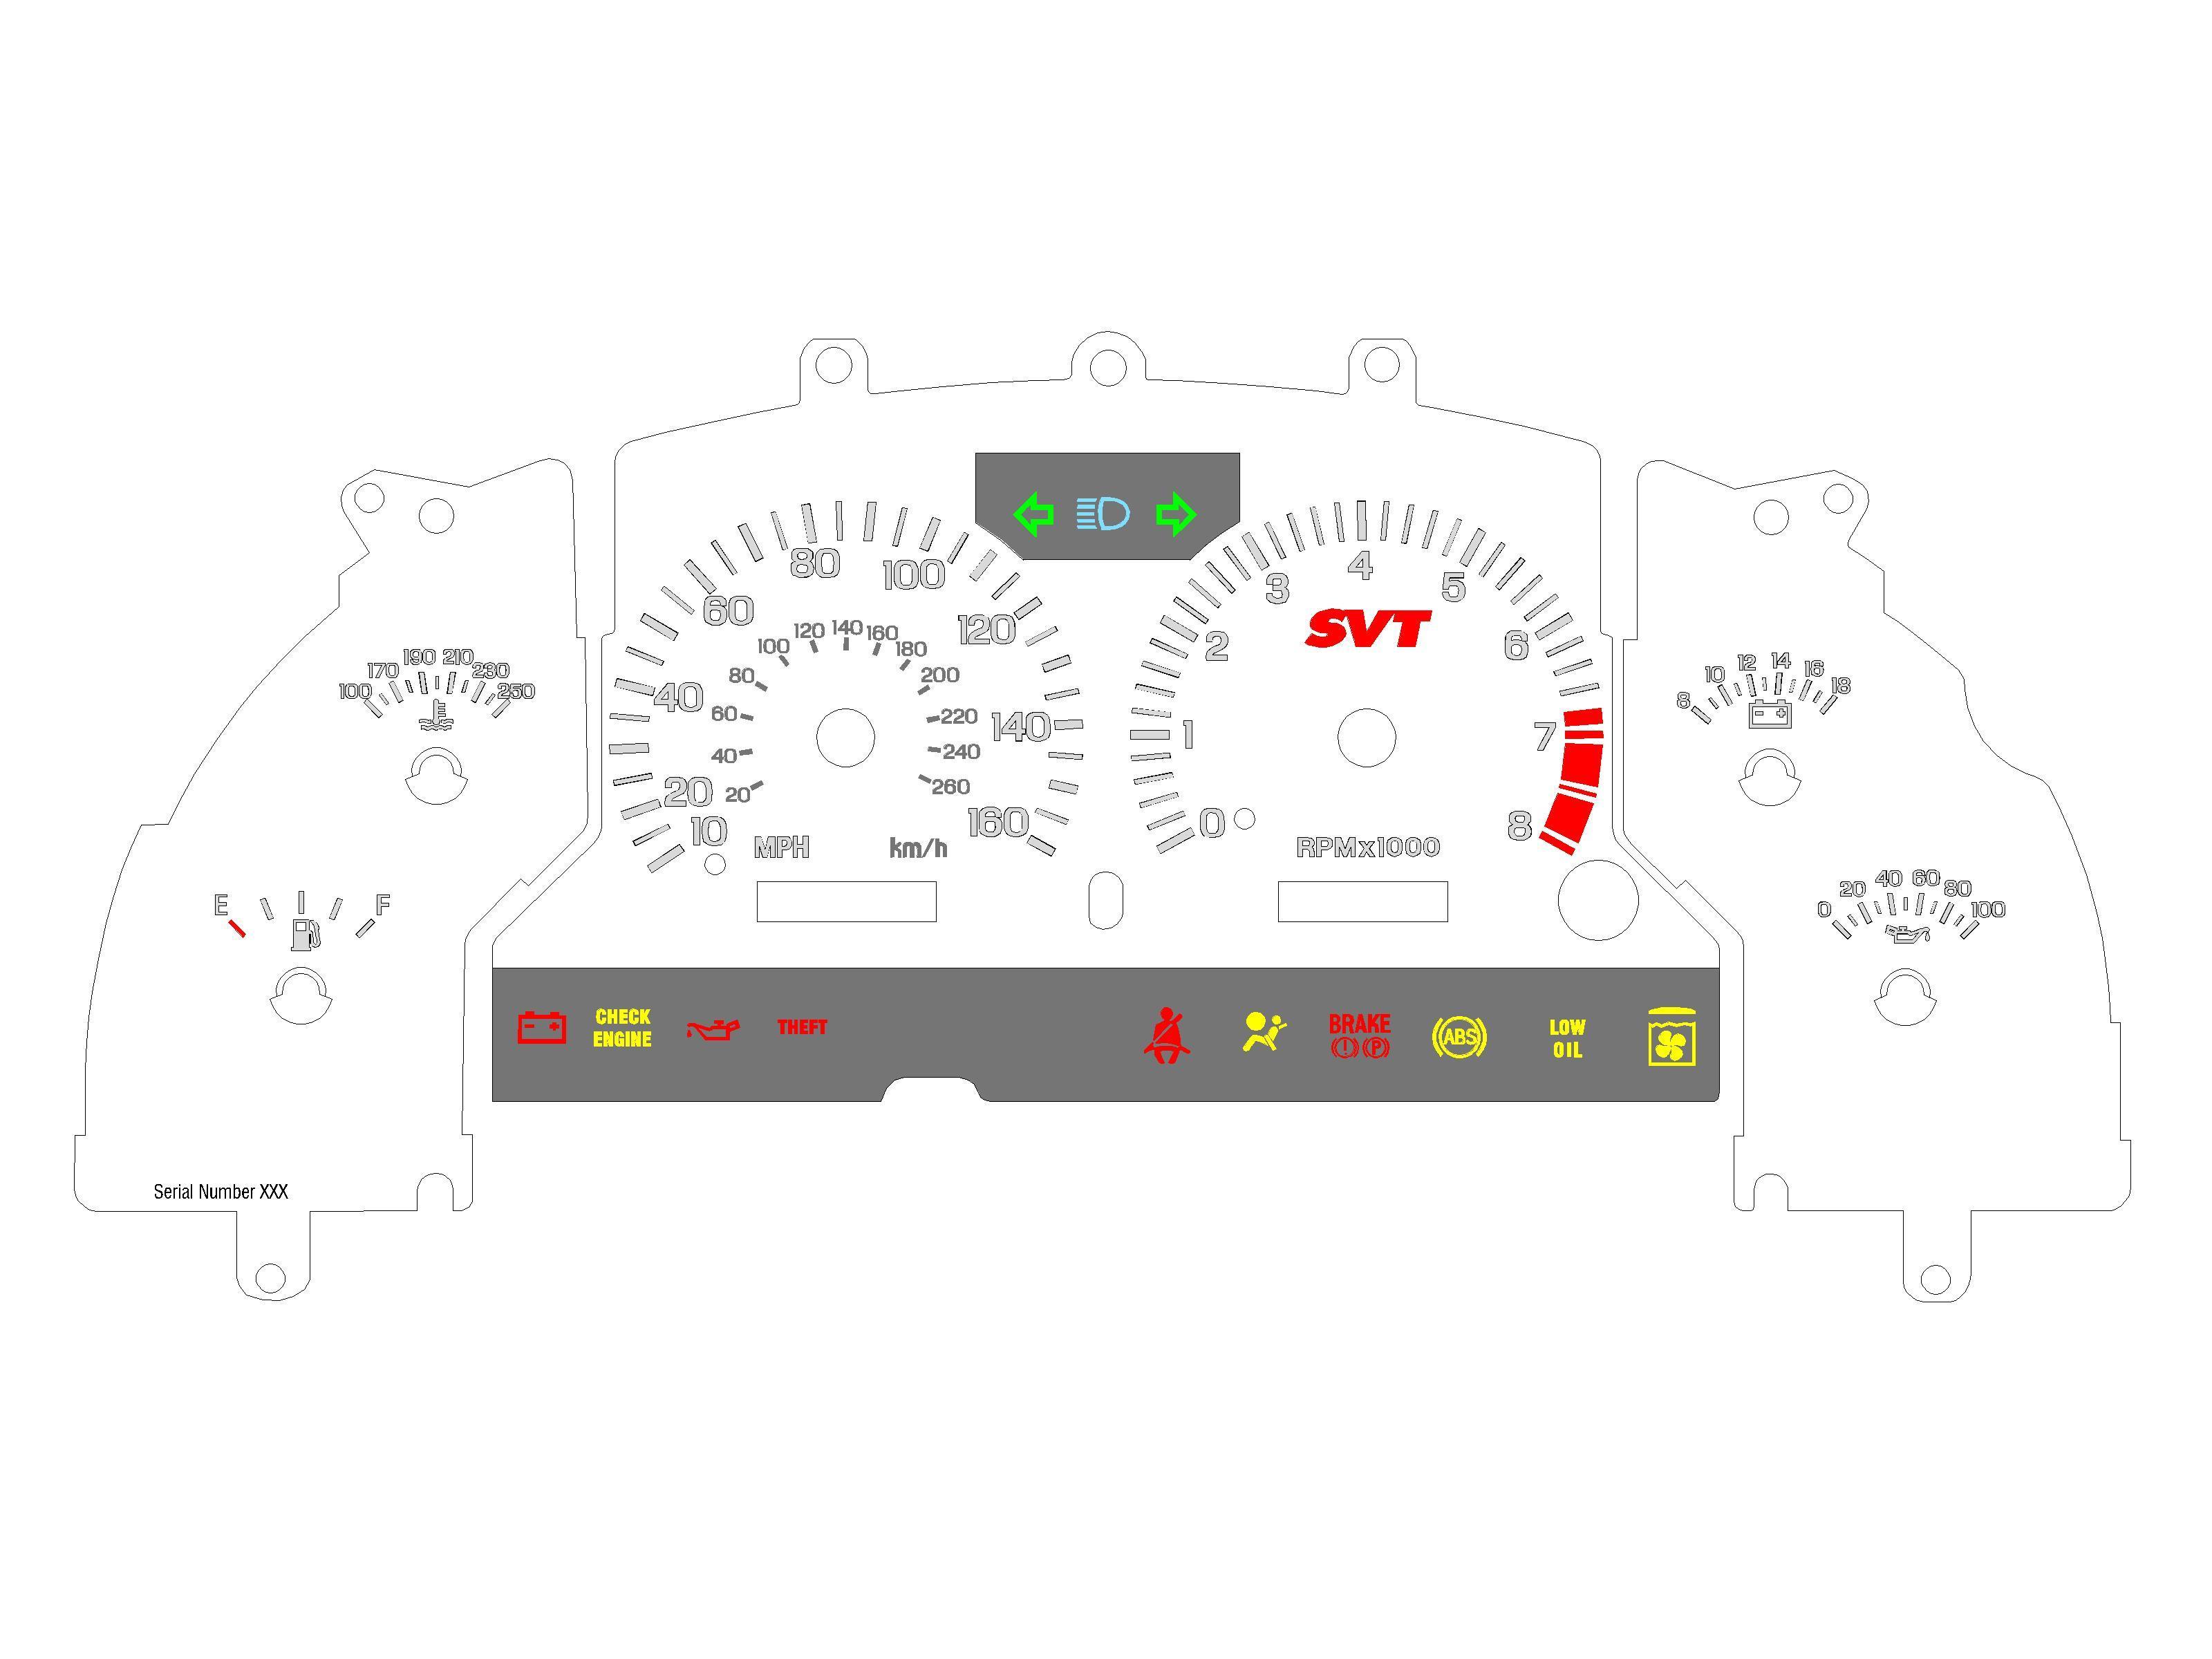 ford mustang oil preusser gauge wiring diagram ford ford 4 6 mustang oil pressure gauge wiring diagram gmc truck